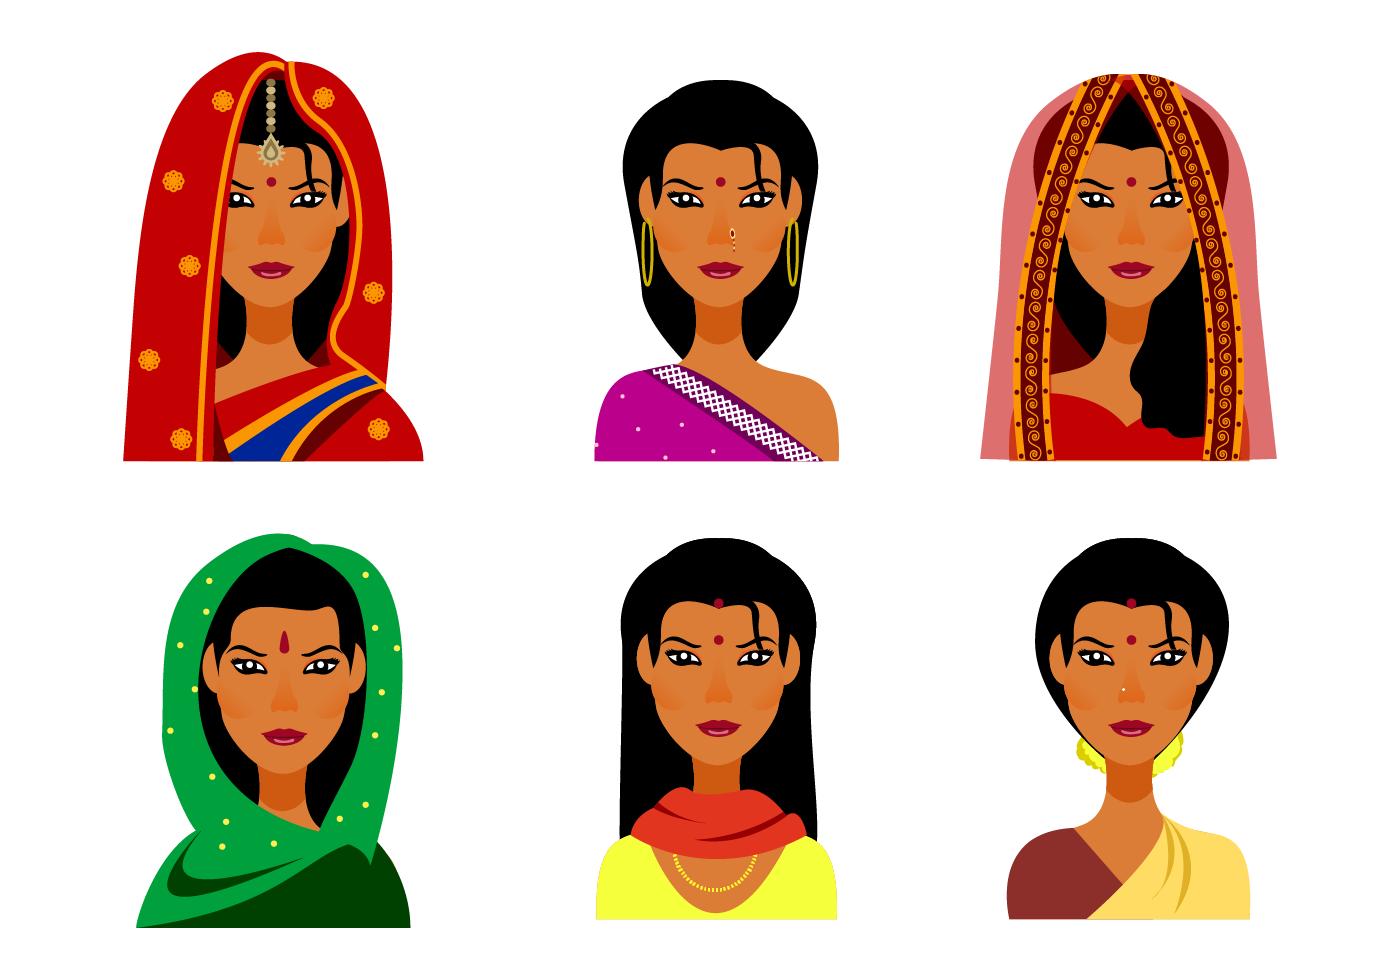 Free Indian Woman Vector Indian Women Vector Art Woman Illustration